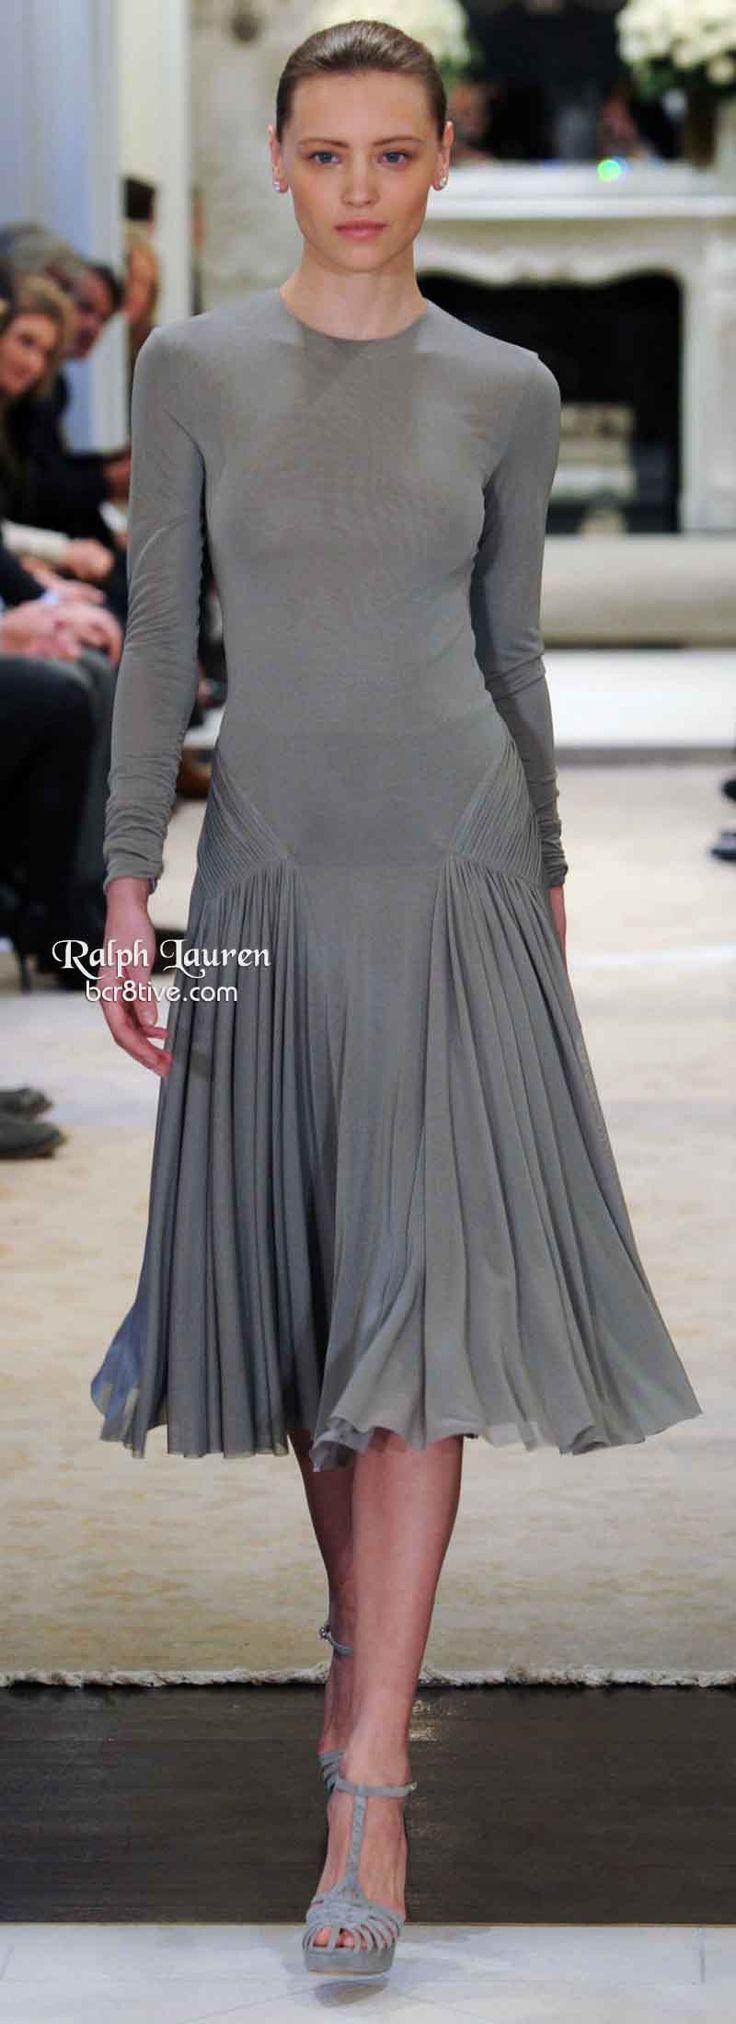 Ralph Lauren Pre Fall 2014 - love the flow of this skirt